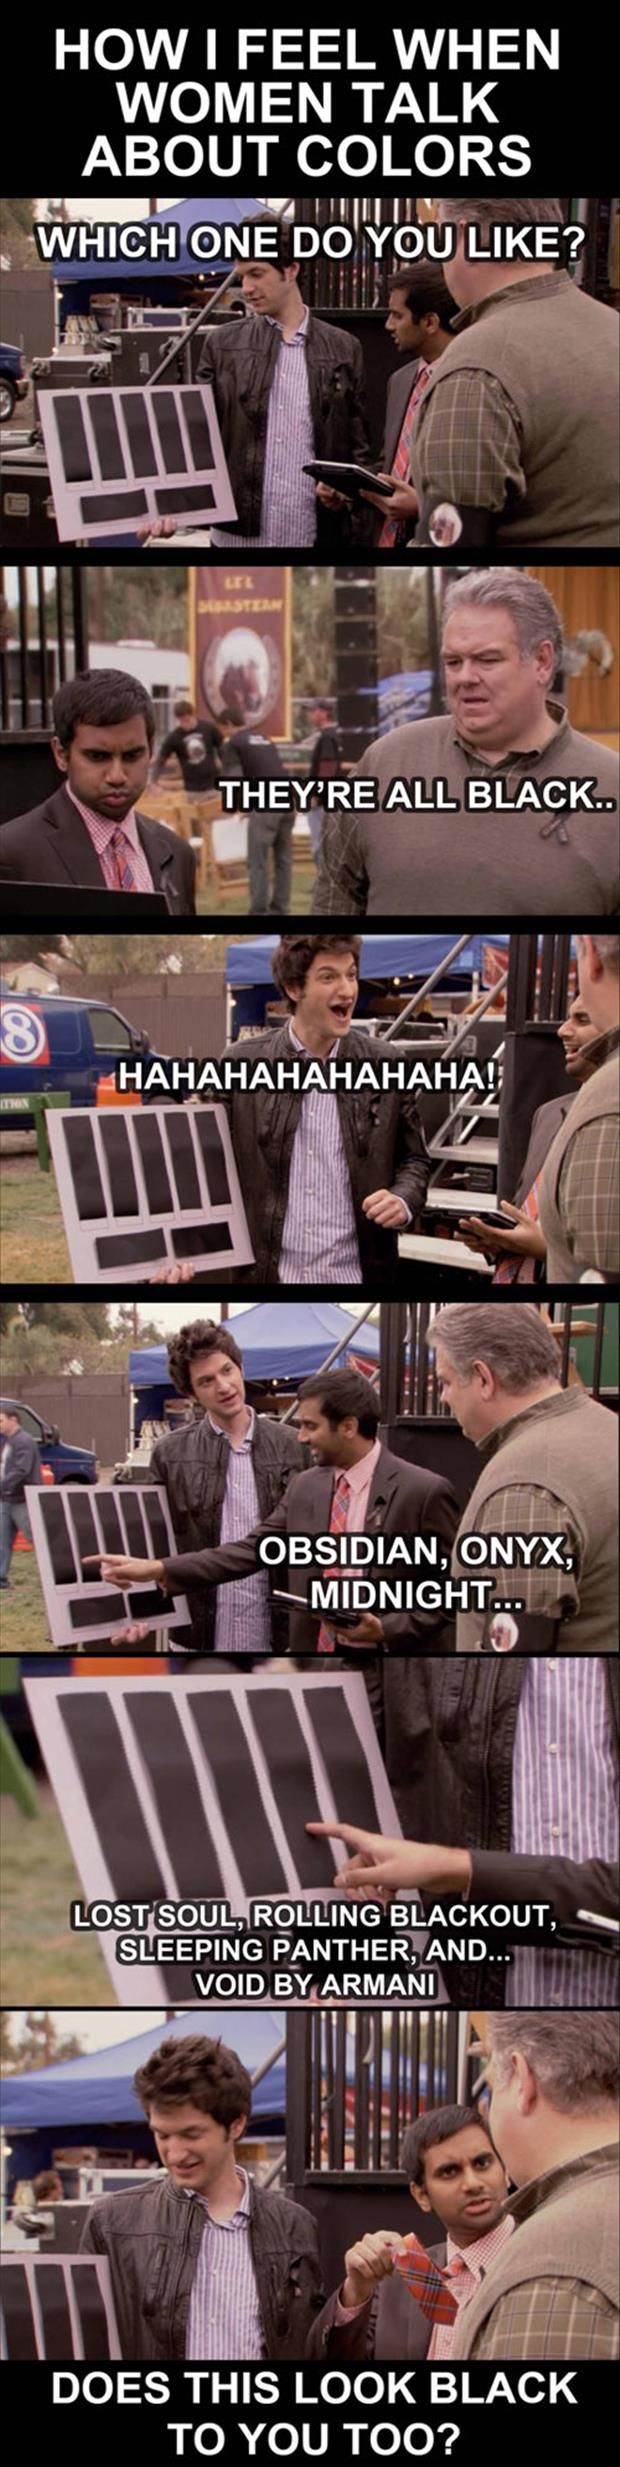 Dump A Day Random Funny Pictures - 58 Pics